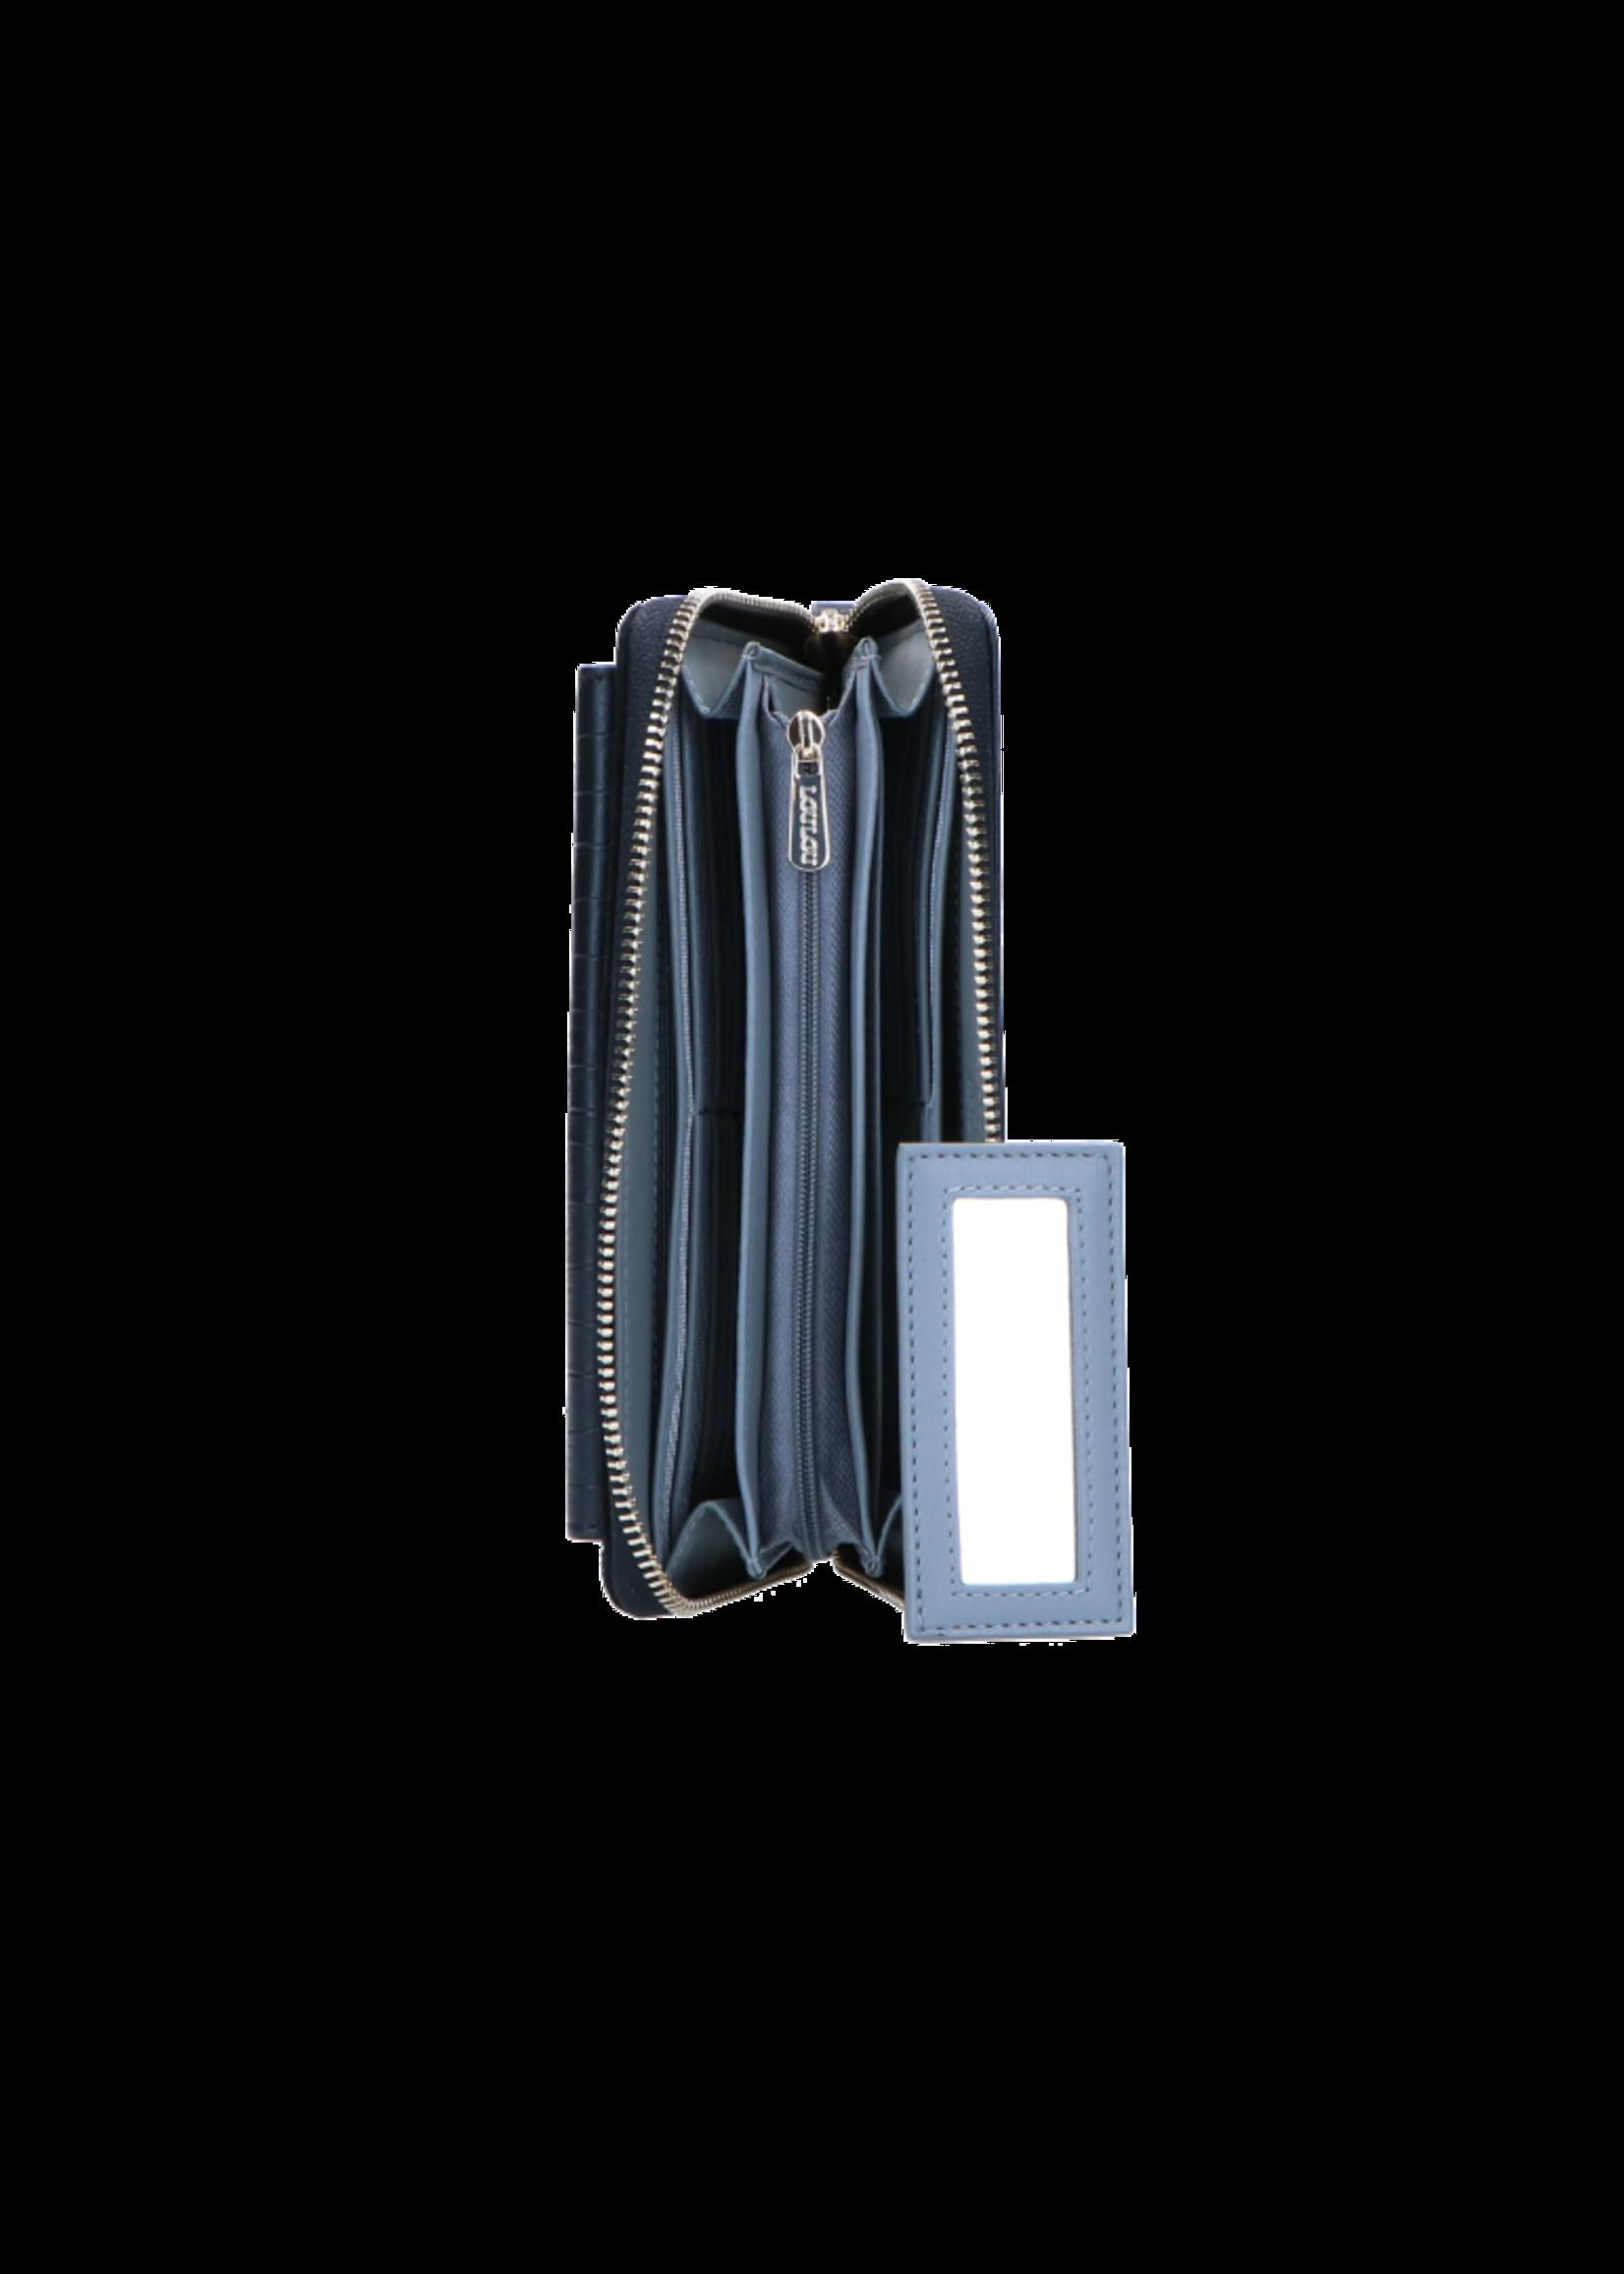 LouLou RFID Portemonnee Classy Croc - Zwart